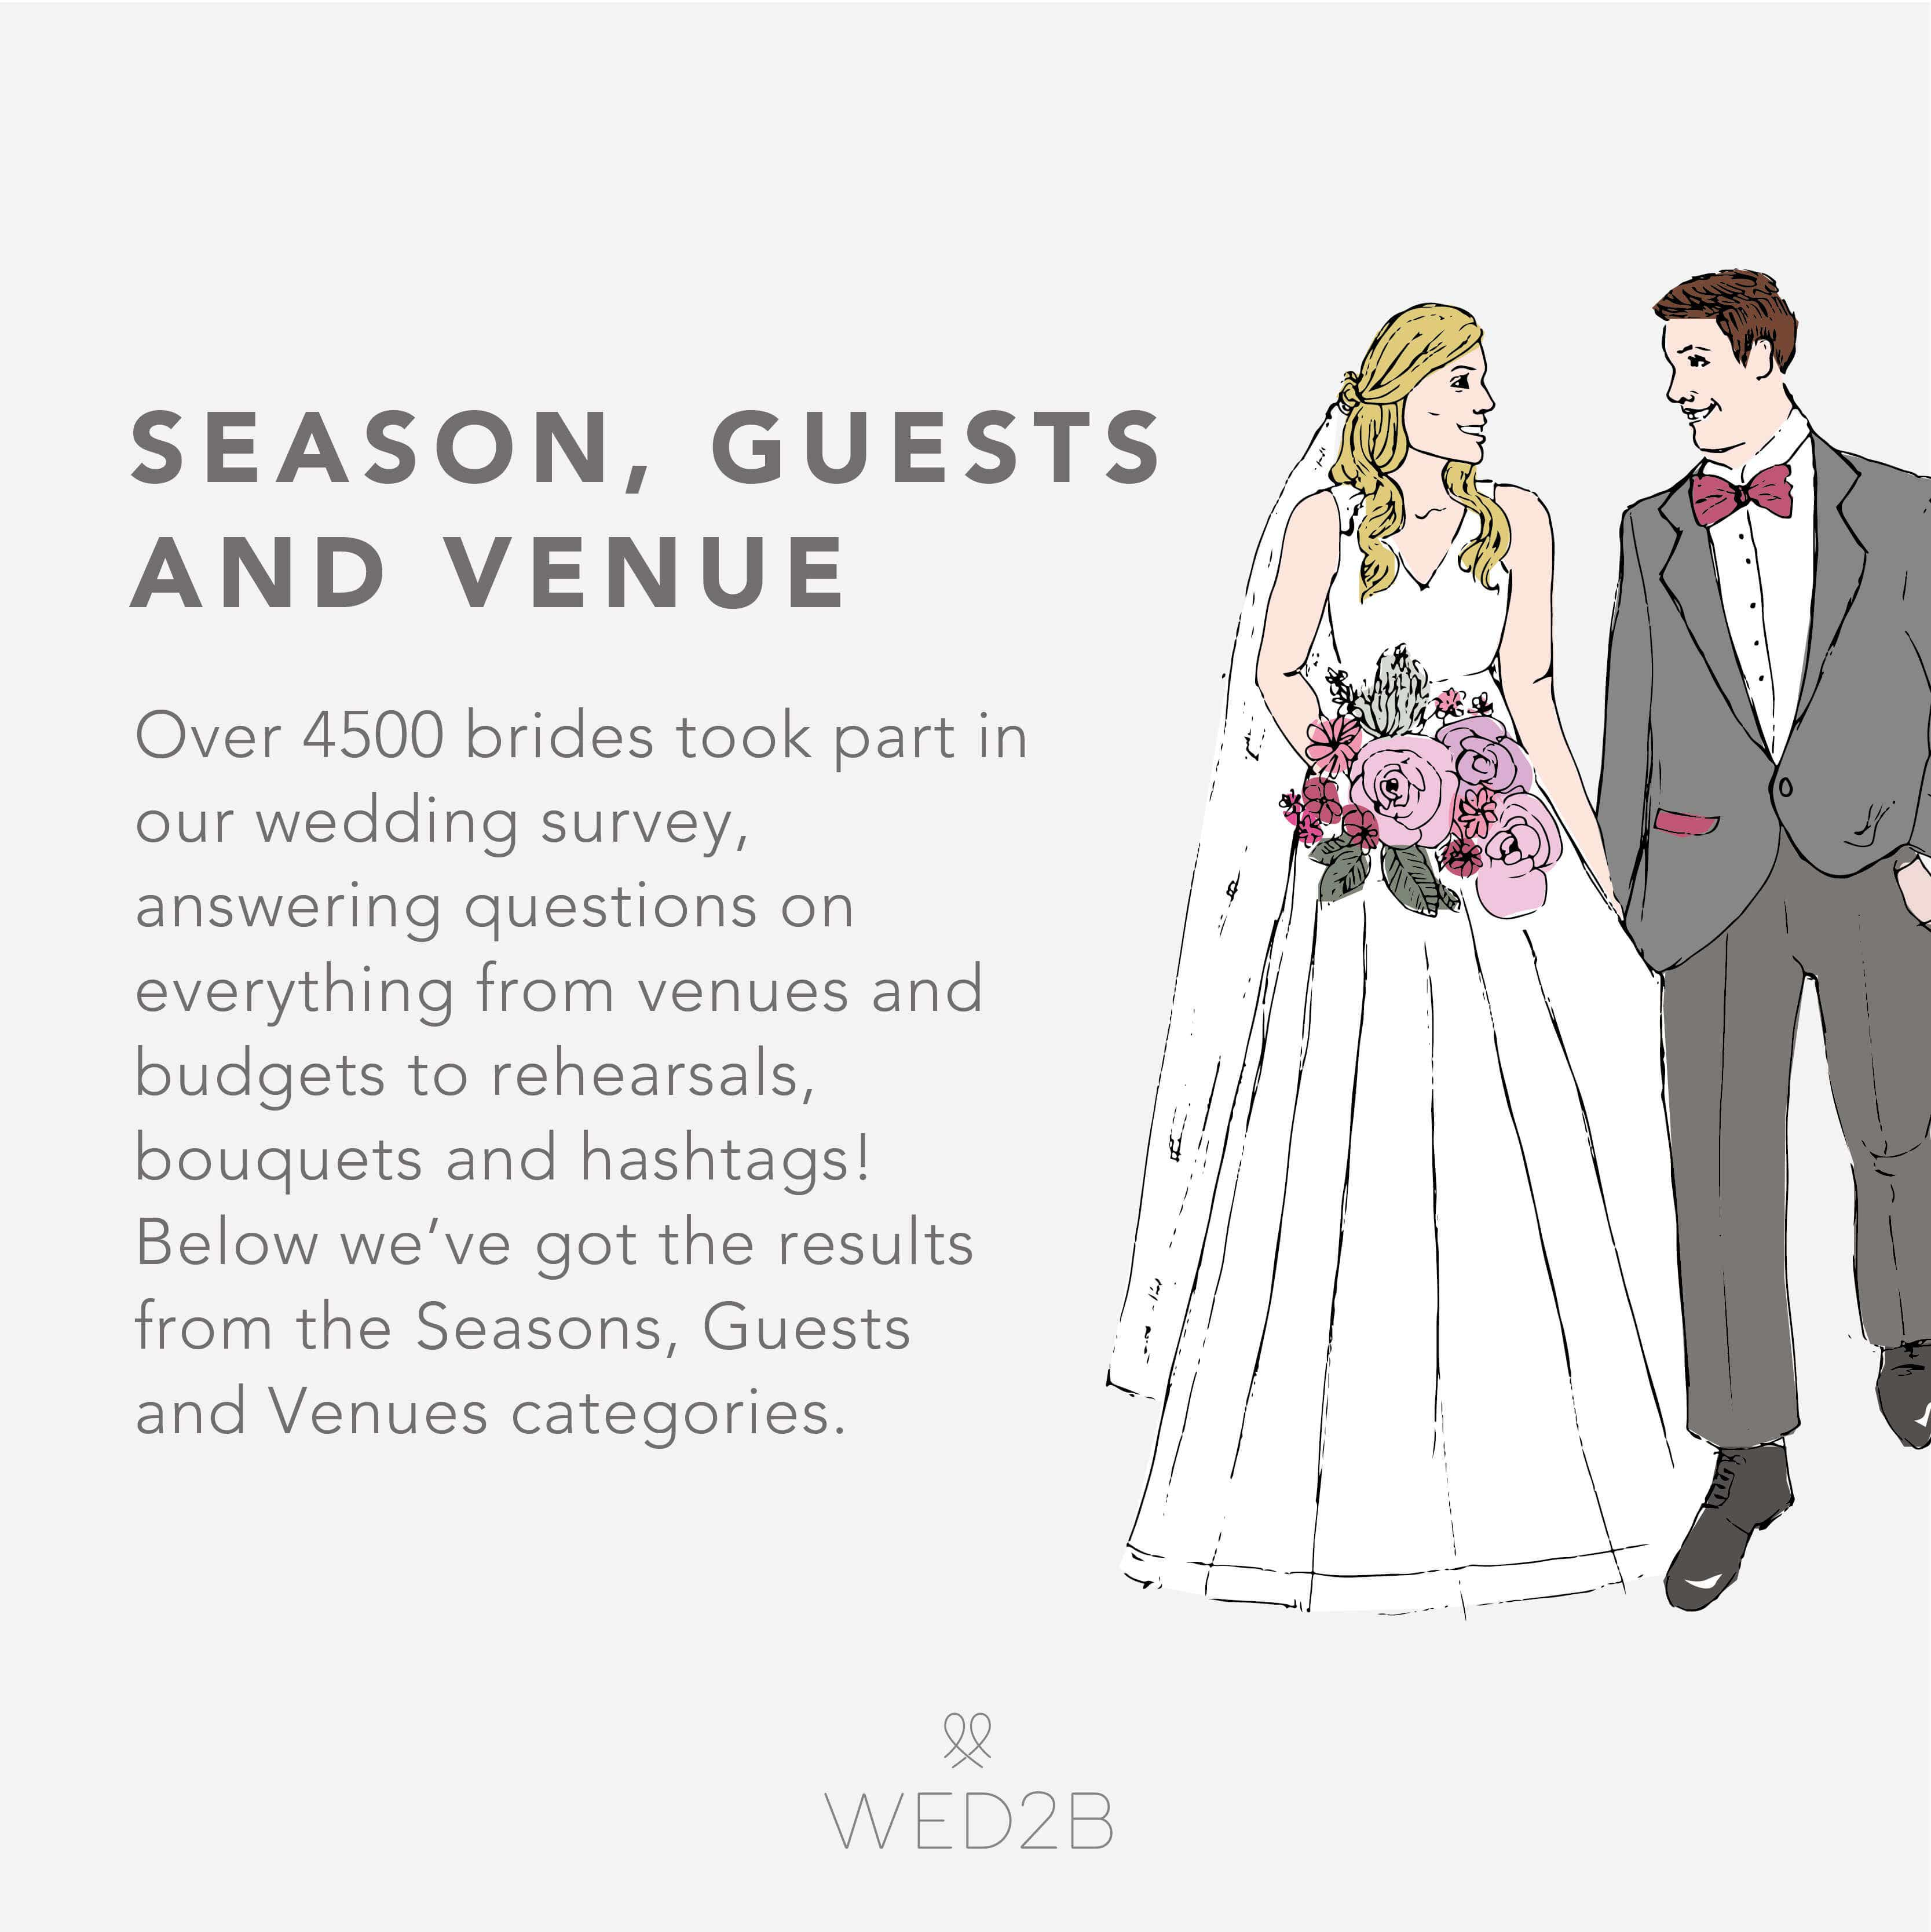 Real Weddings North East: Ideas And Planning - Wedding Season Begins